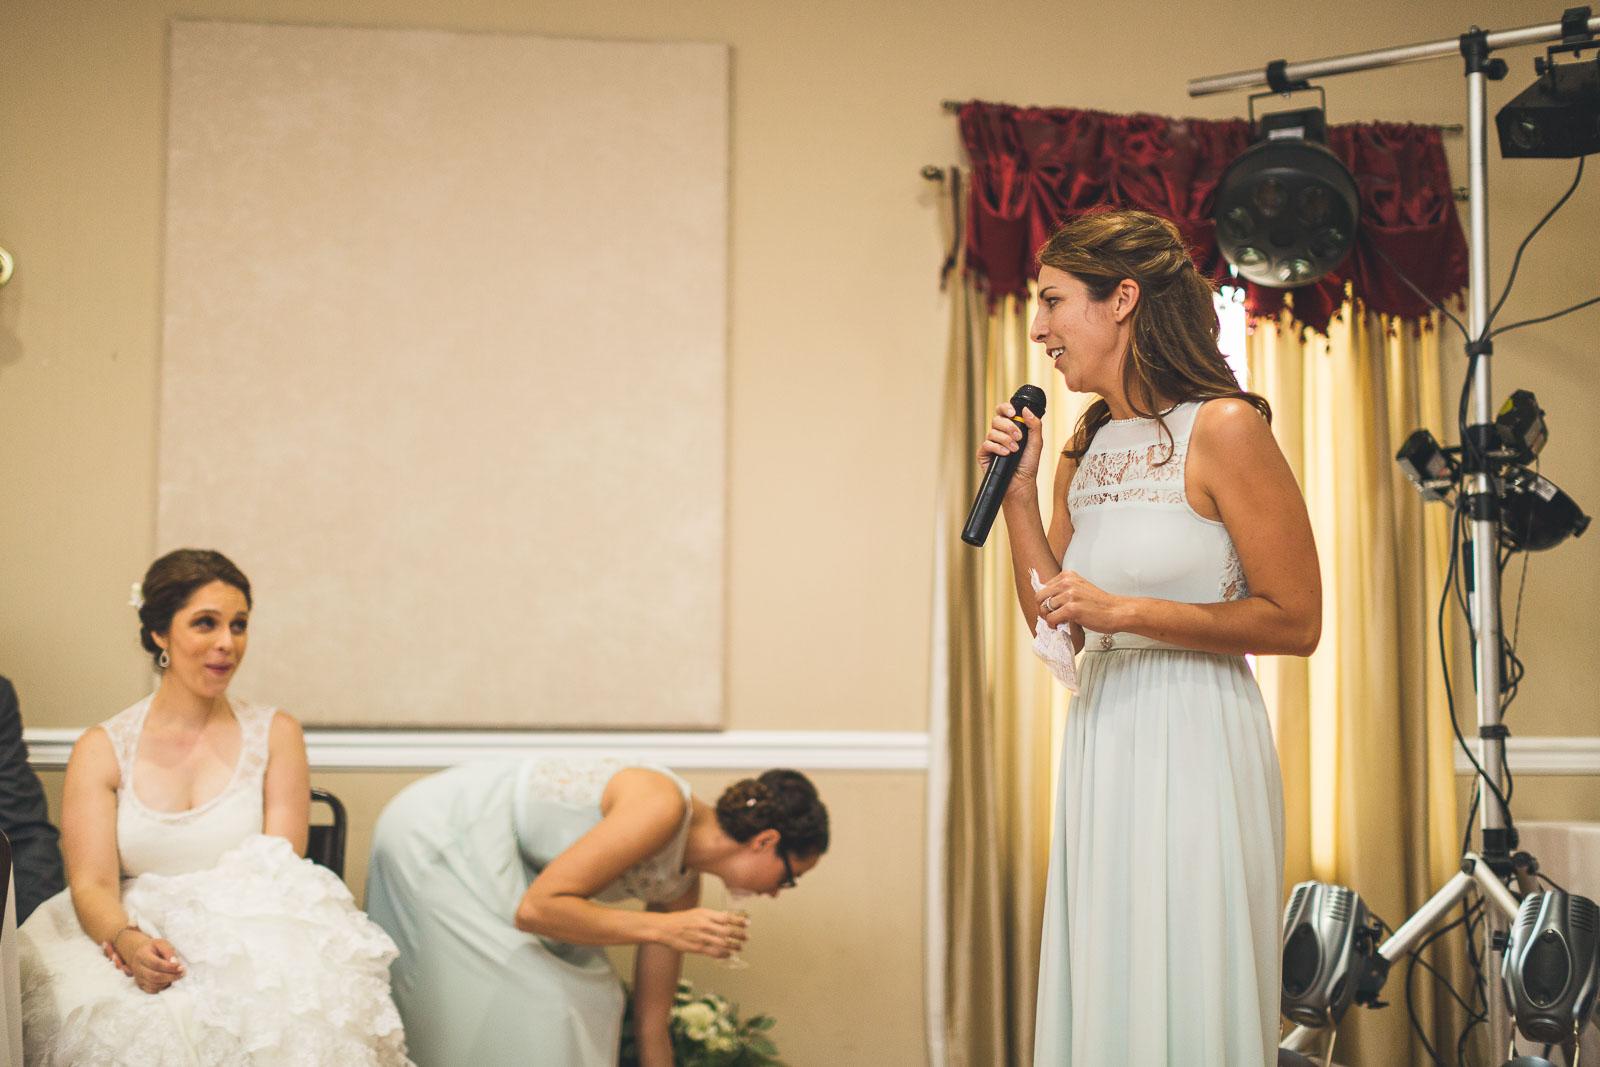 Sister gives Speech